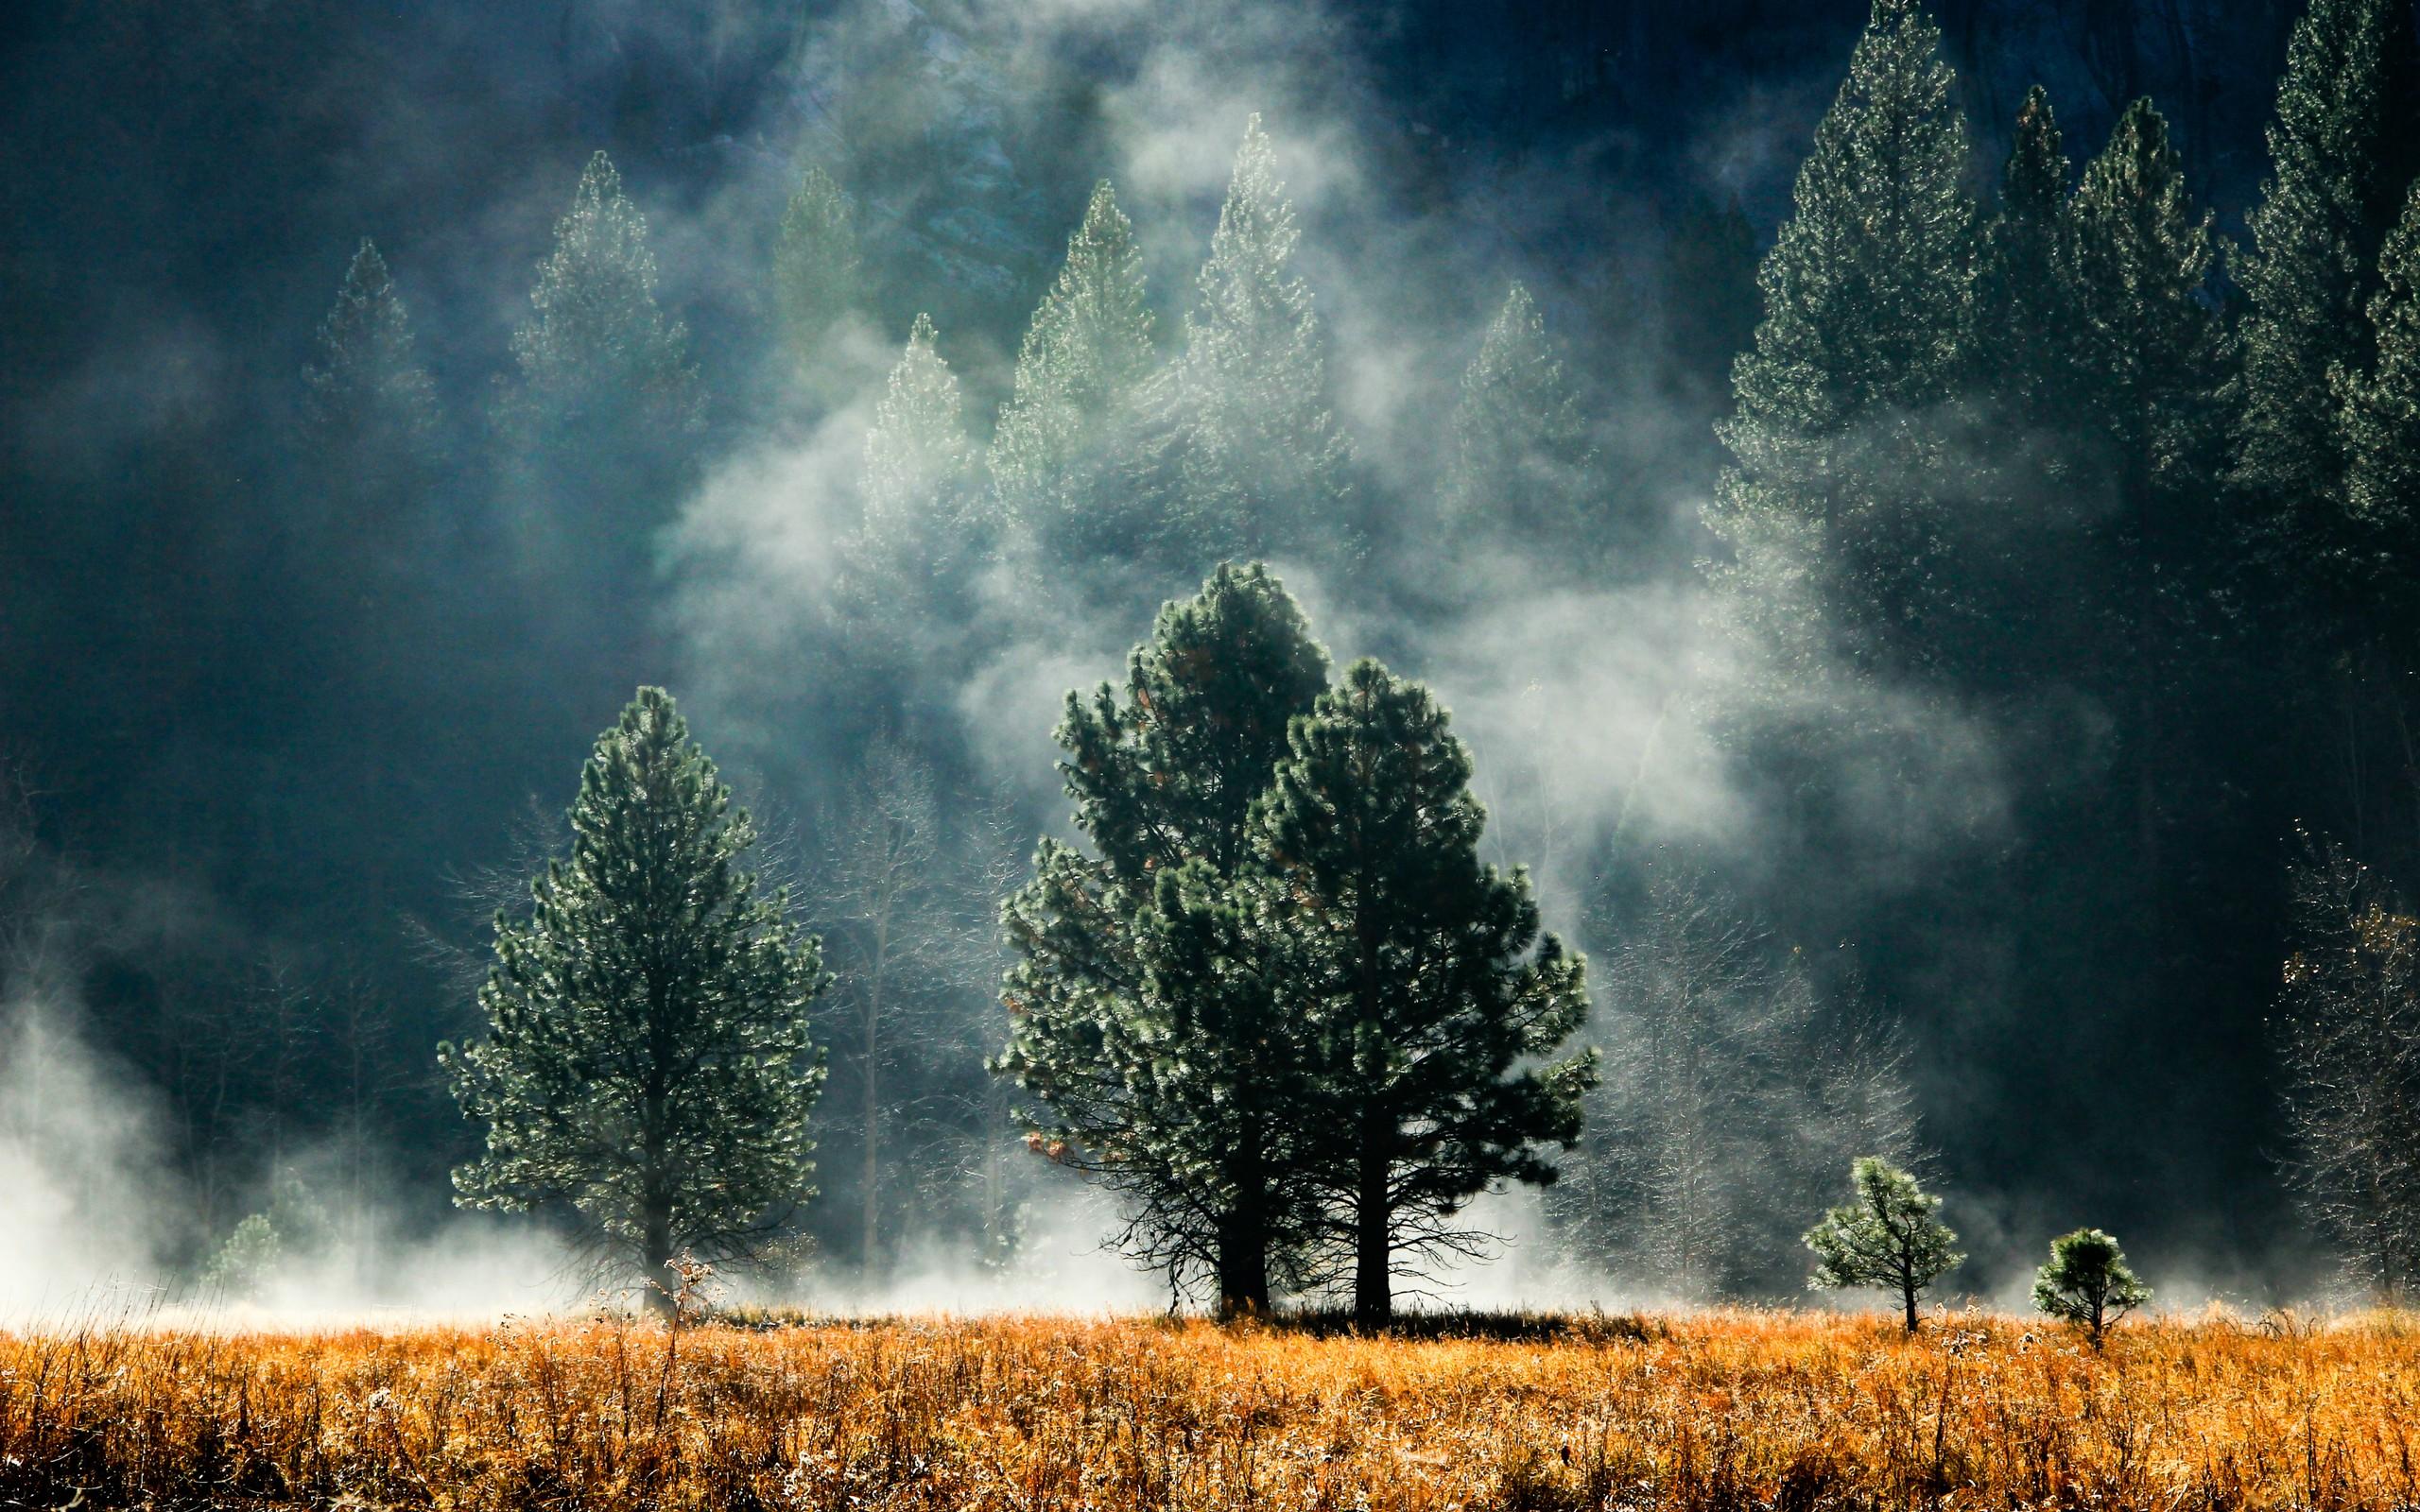 Fog wallpaper hd 36614 2560x1600 px hdwallsource fog wallpaper hd 36614 voltagebd Choice Image